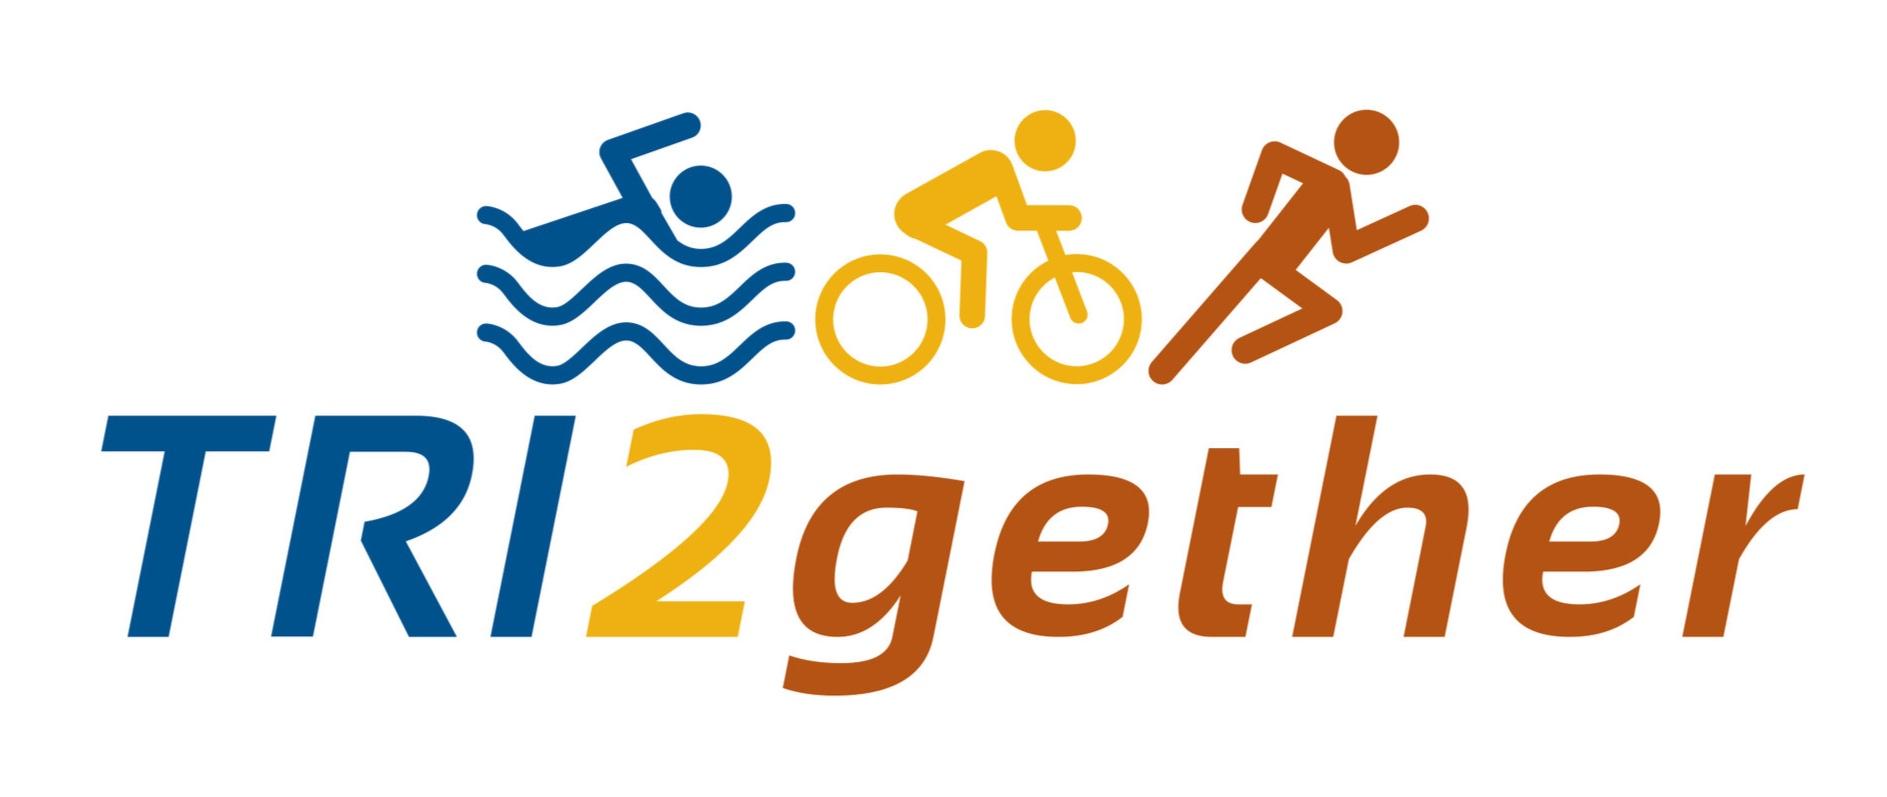 22690_TRI2gether_logo_HV_02+.jpg